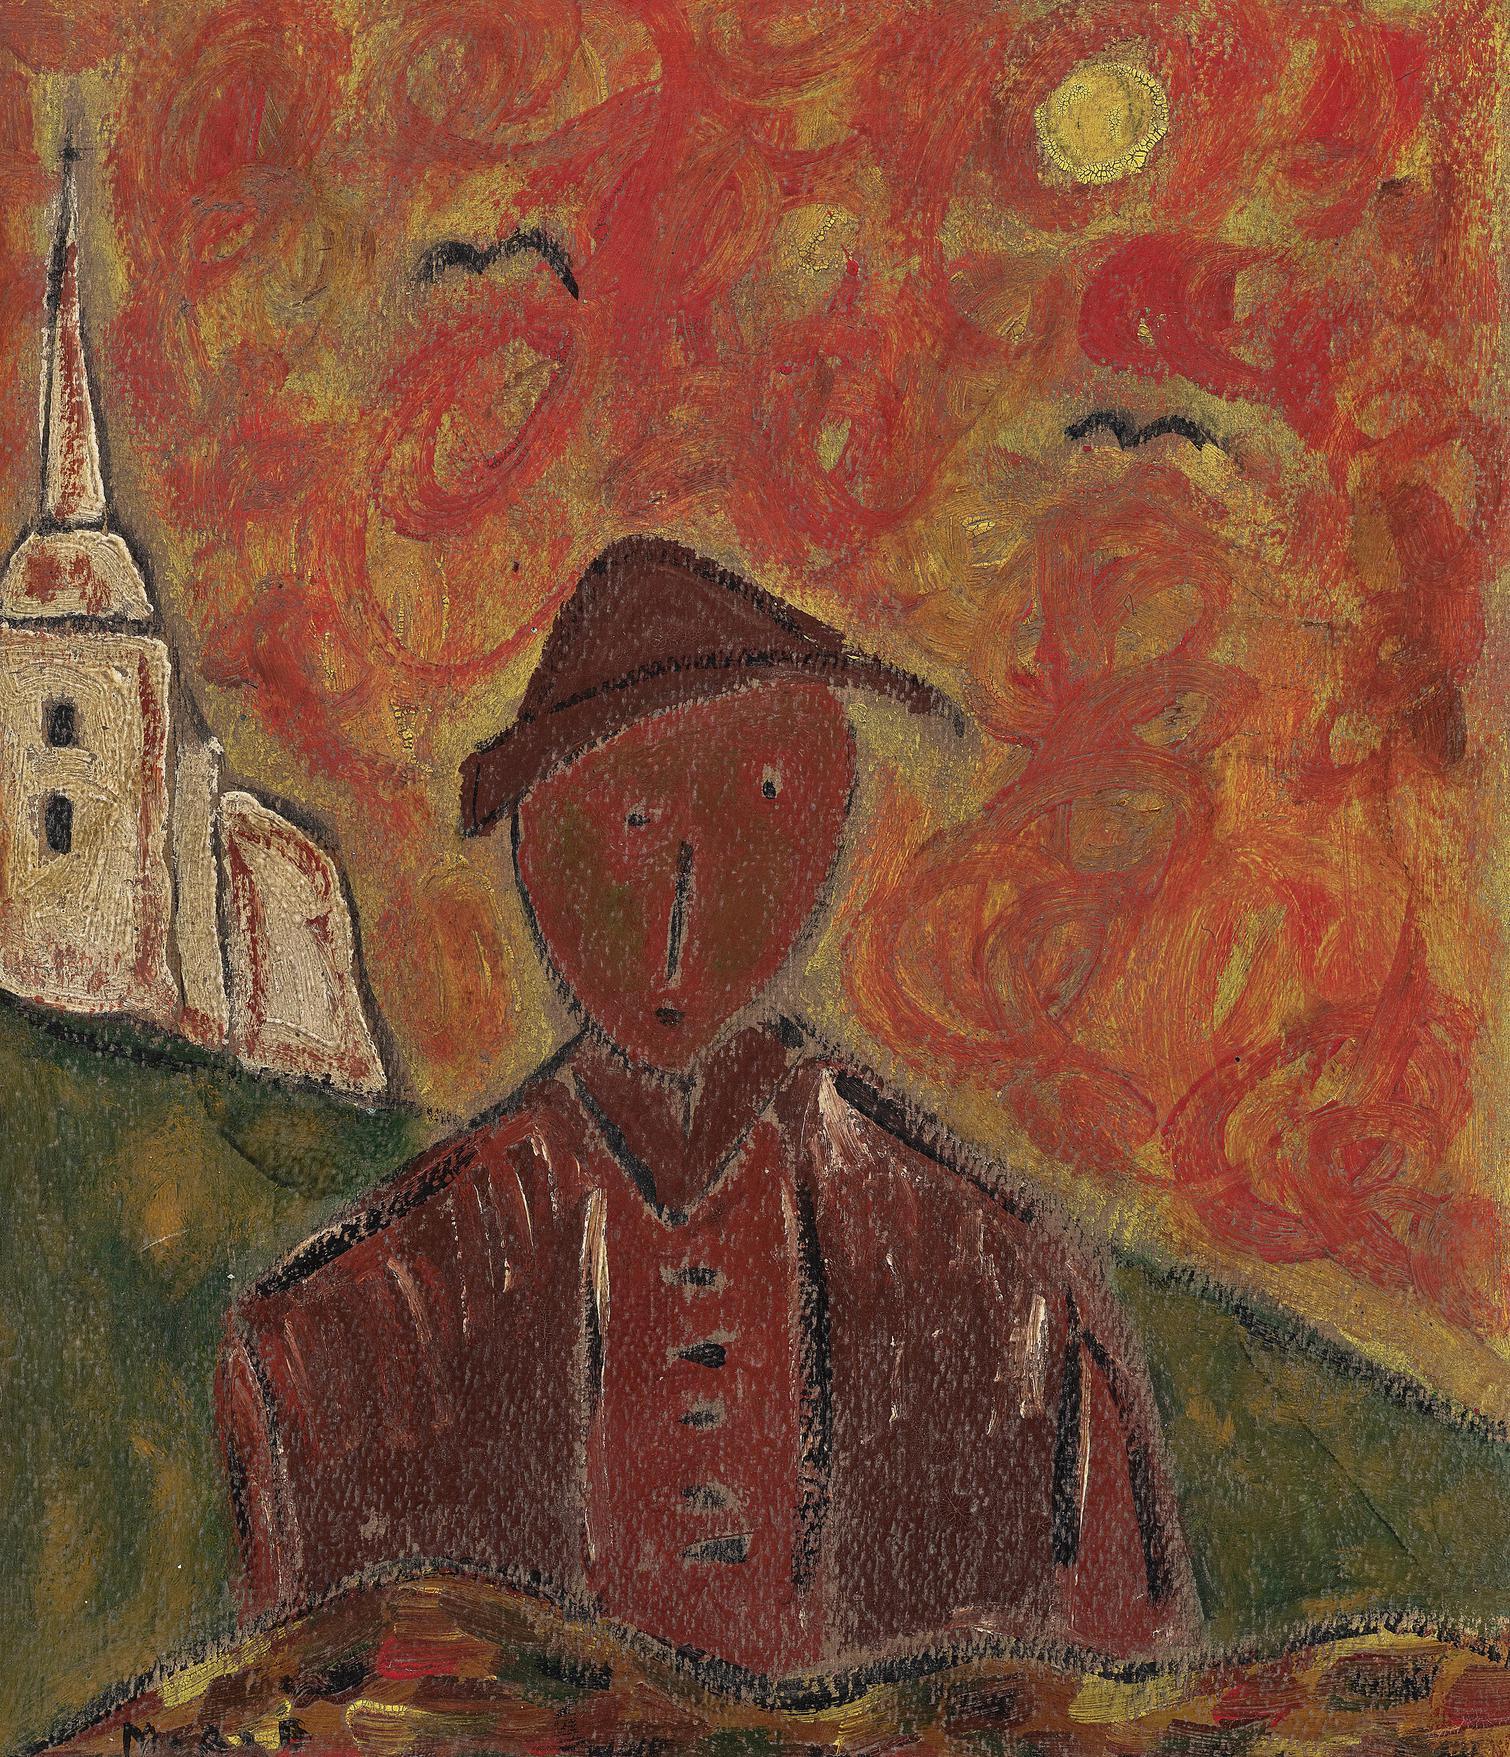 Milos Alexander Bazovsky - Portrat Eines Jungen Bauern Mit Kirche (Portrait of a Young Farmer with Church)-